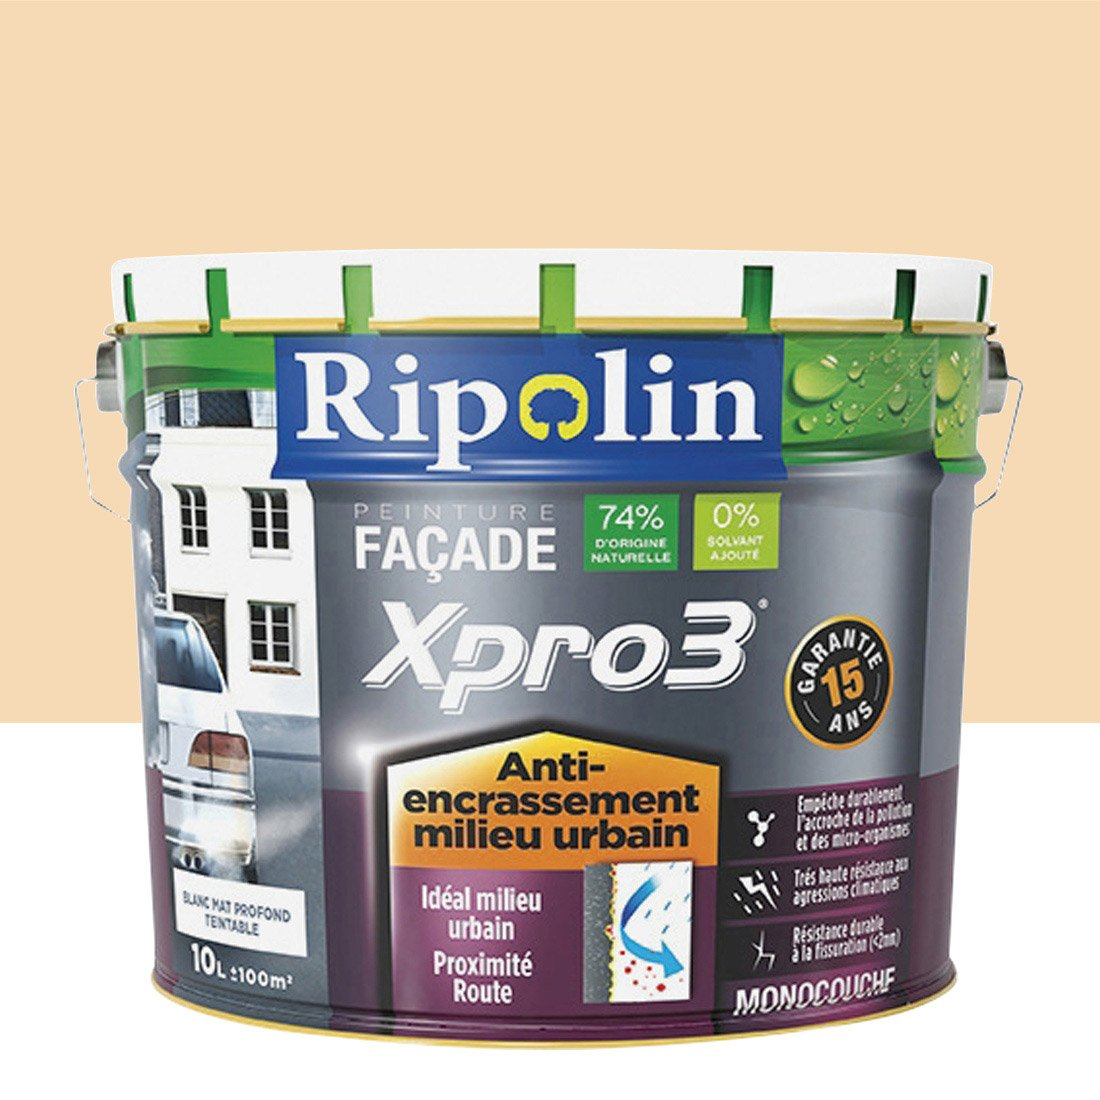 peinture fa ade murs encrass s xpro3 ripolin ton pierre 10 l leroy merlin. Black Bedroom Furniture Sets. Home Design Ideas